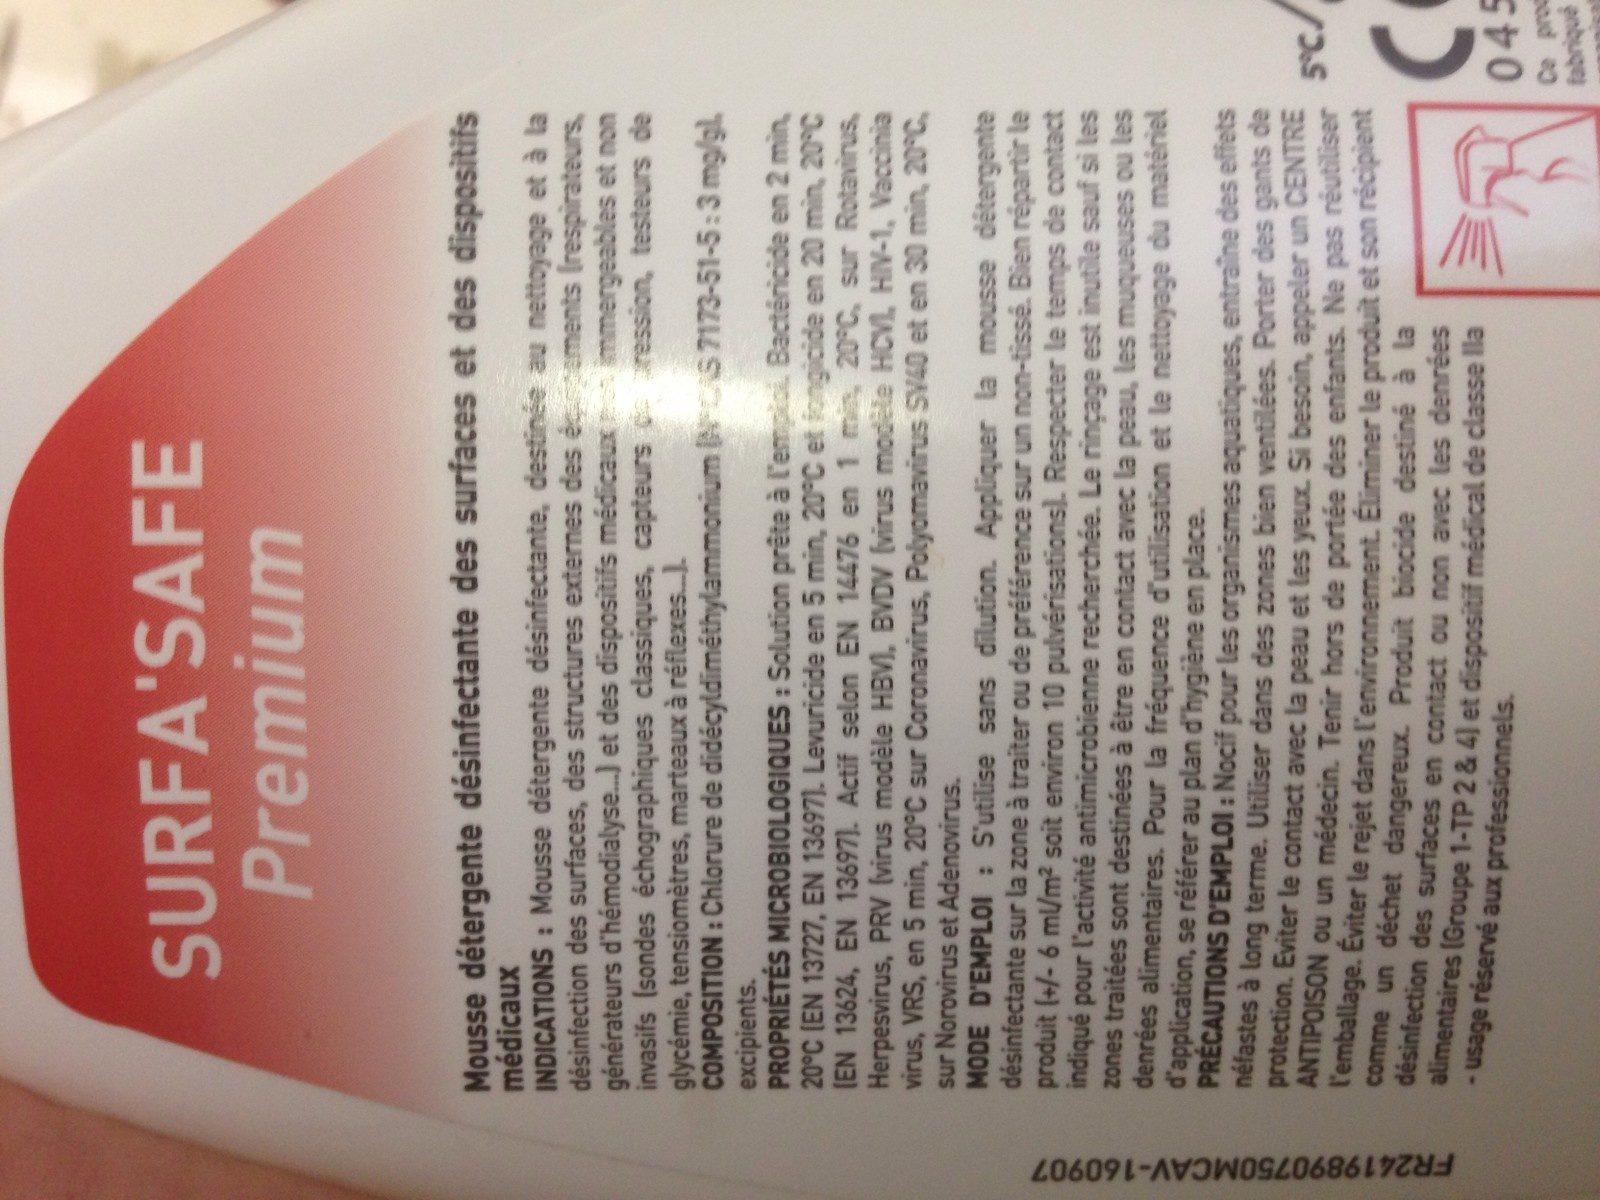 Anios Surfa'safe Premium Mousse Compacte 750 ML - Ingredients - fr